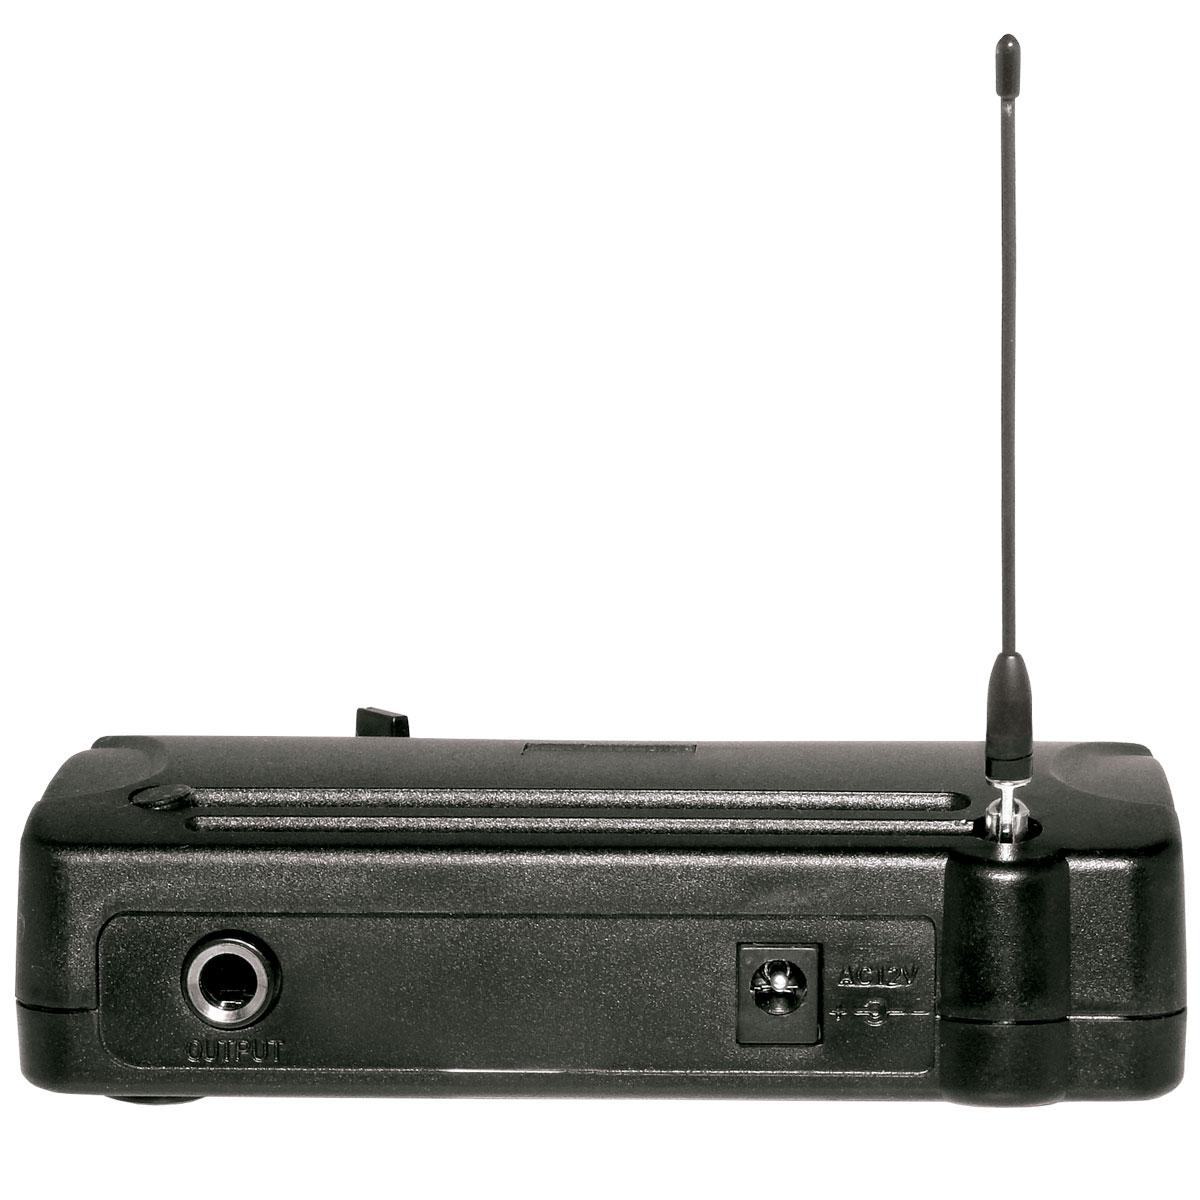 104H - Microfone s/ Fio de Mão VHF 104 H - CSR